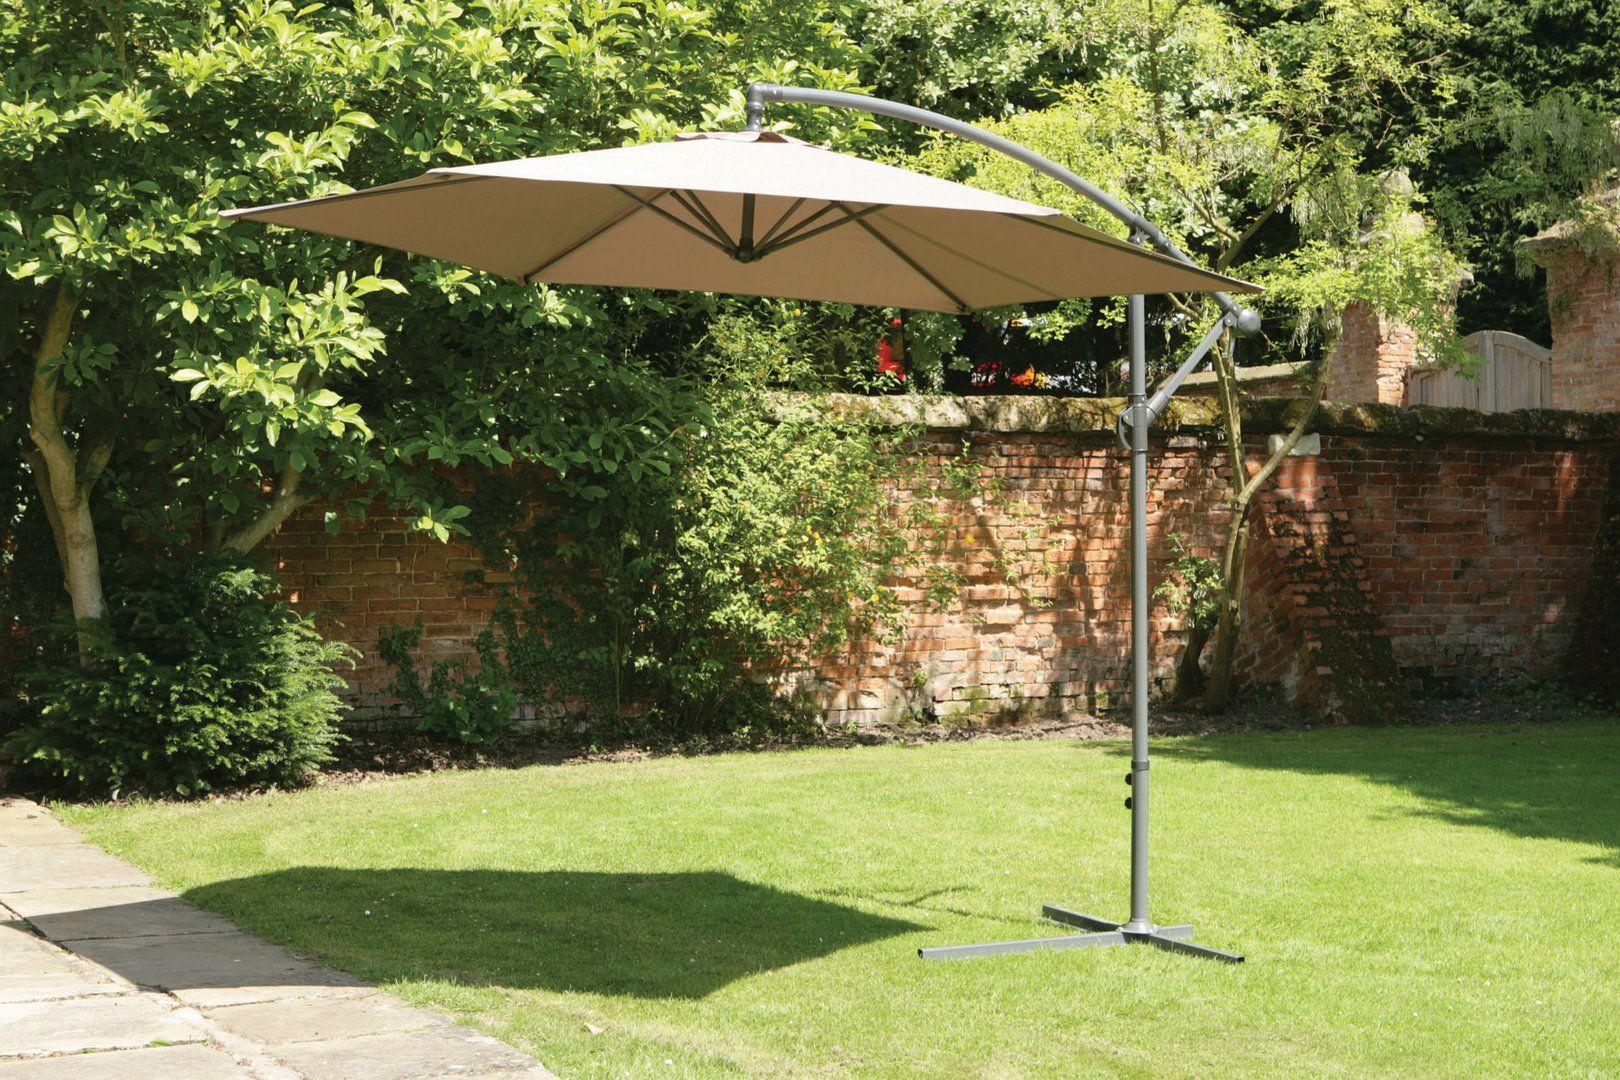 Uk Gardens 3m Cream Beige Cantilever Hanging Garden Parasol Umbrella